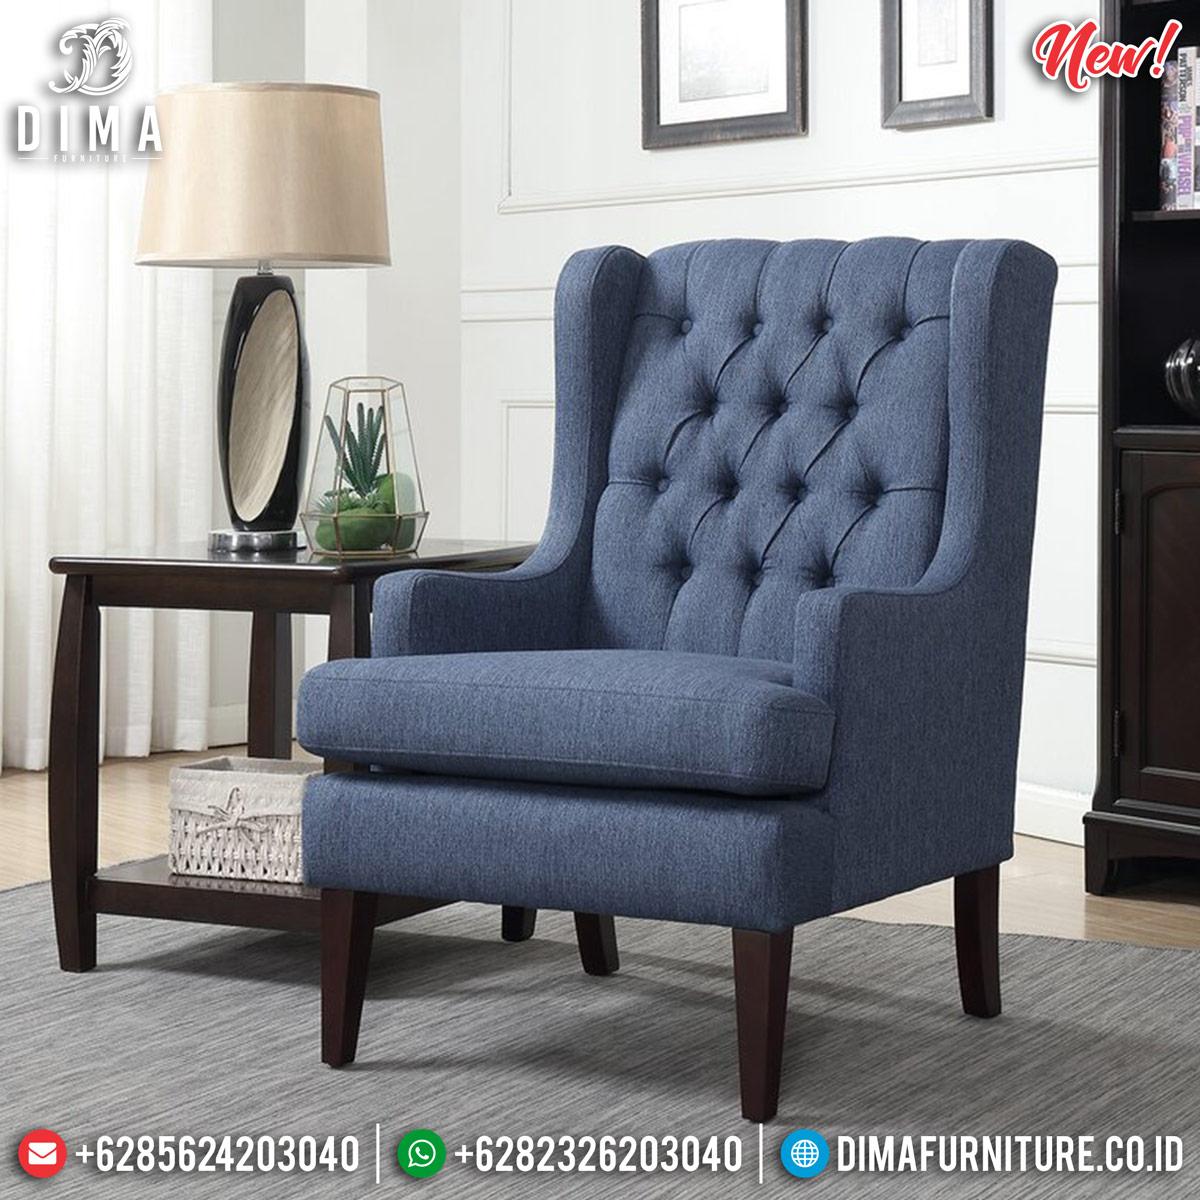 Sofa Minimalis Jepara Desain Minimalist Modern New Product Furniture Jepara TTJ-0889